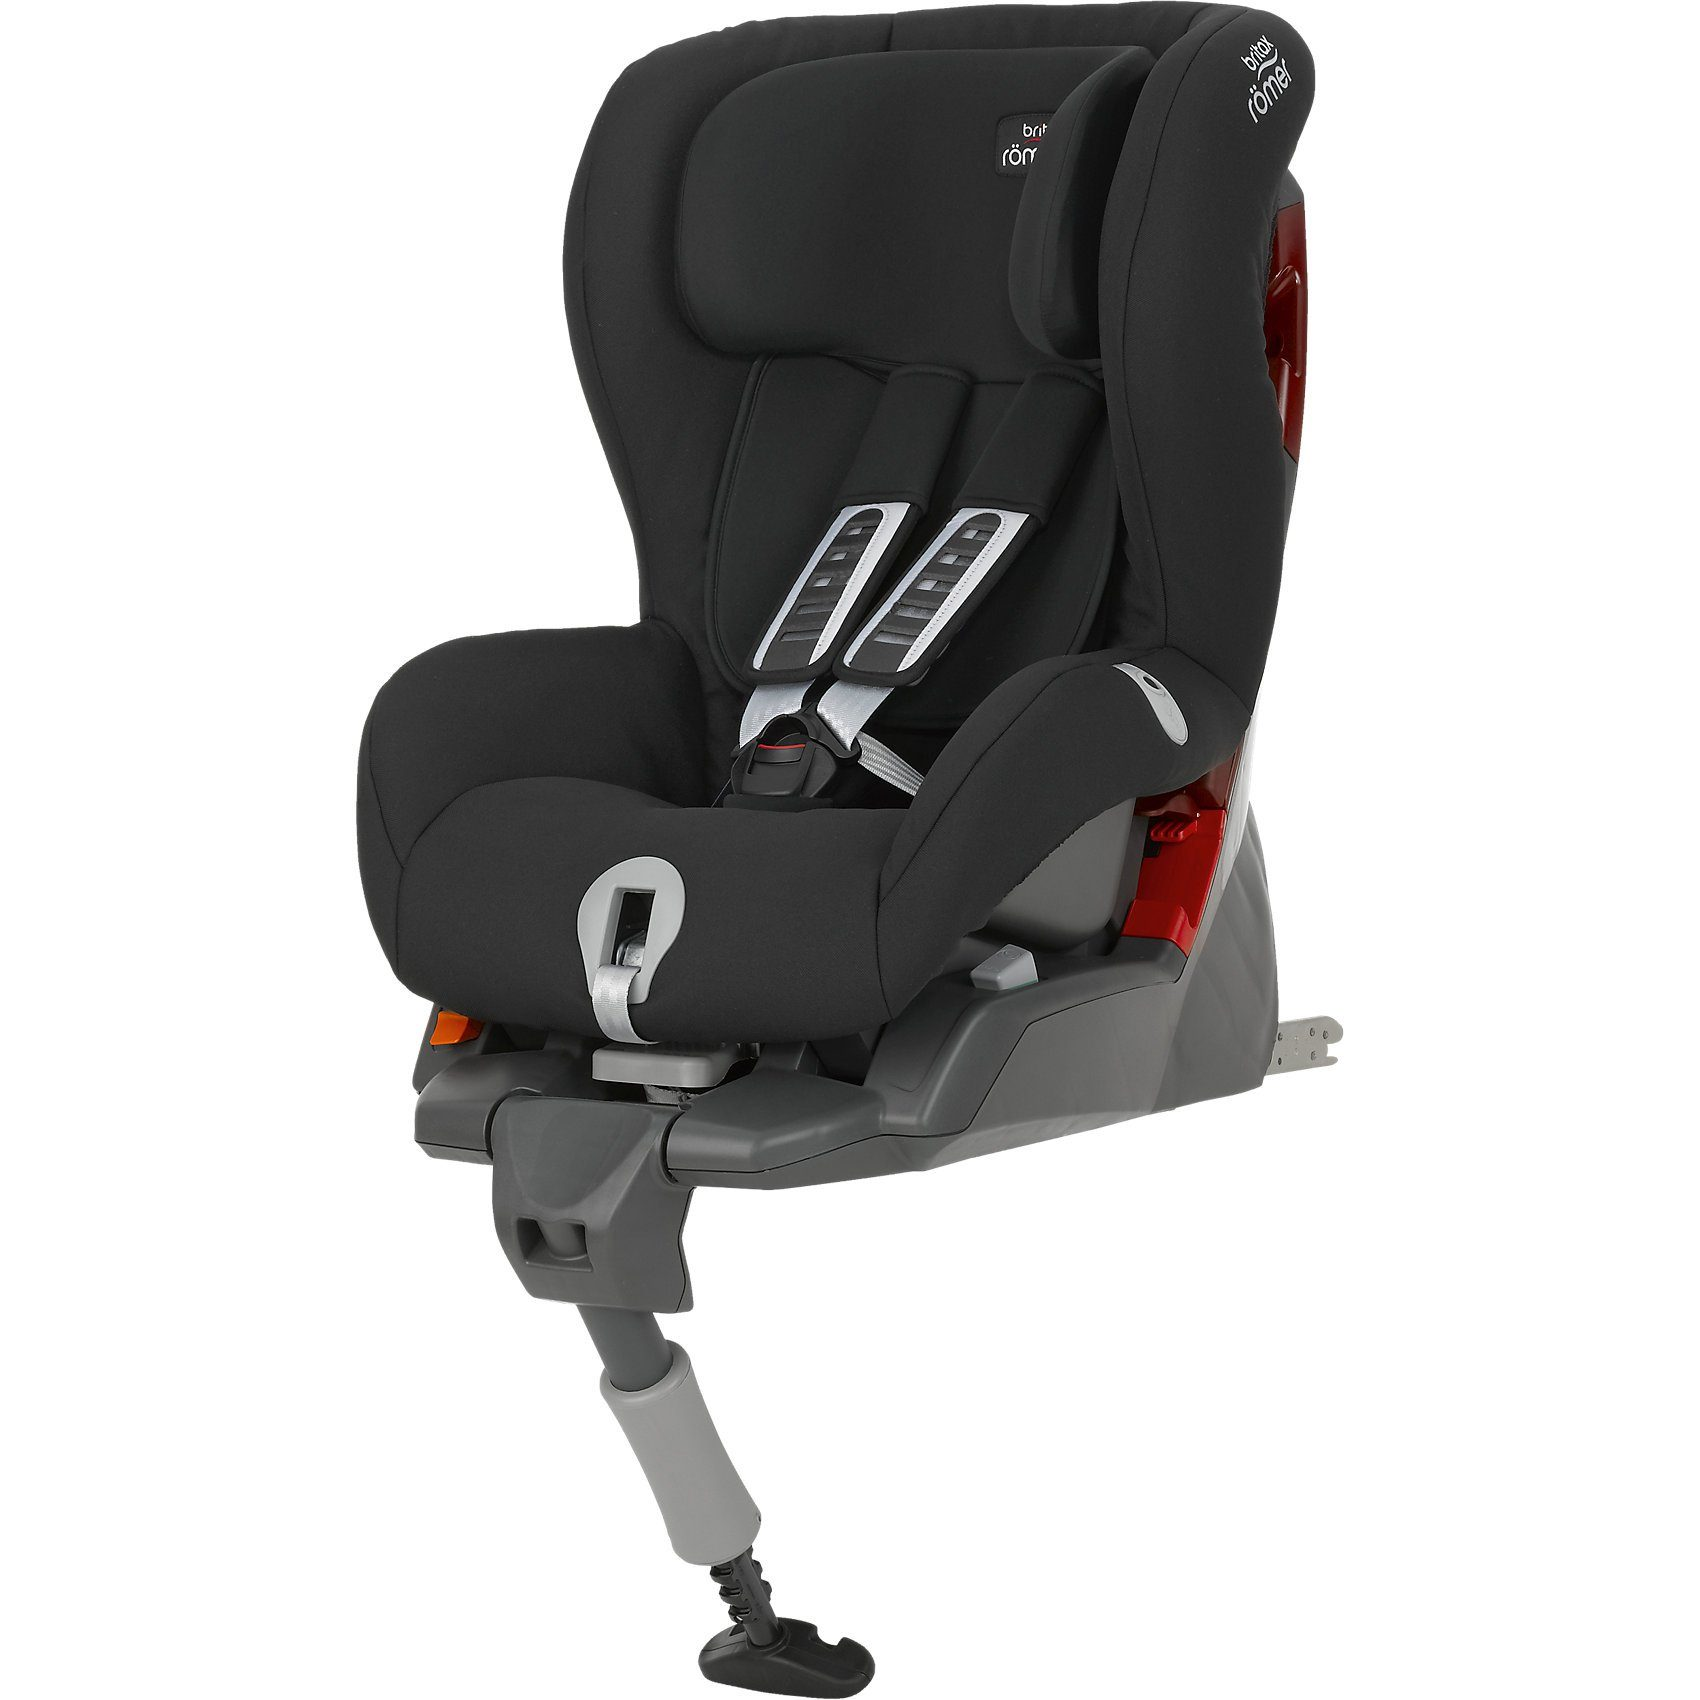 Britax Römer Auto-Kindersitz Safefix Plus, Cosmos Black, 2016